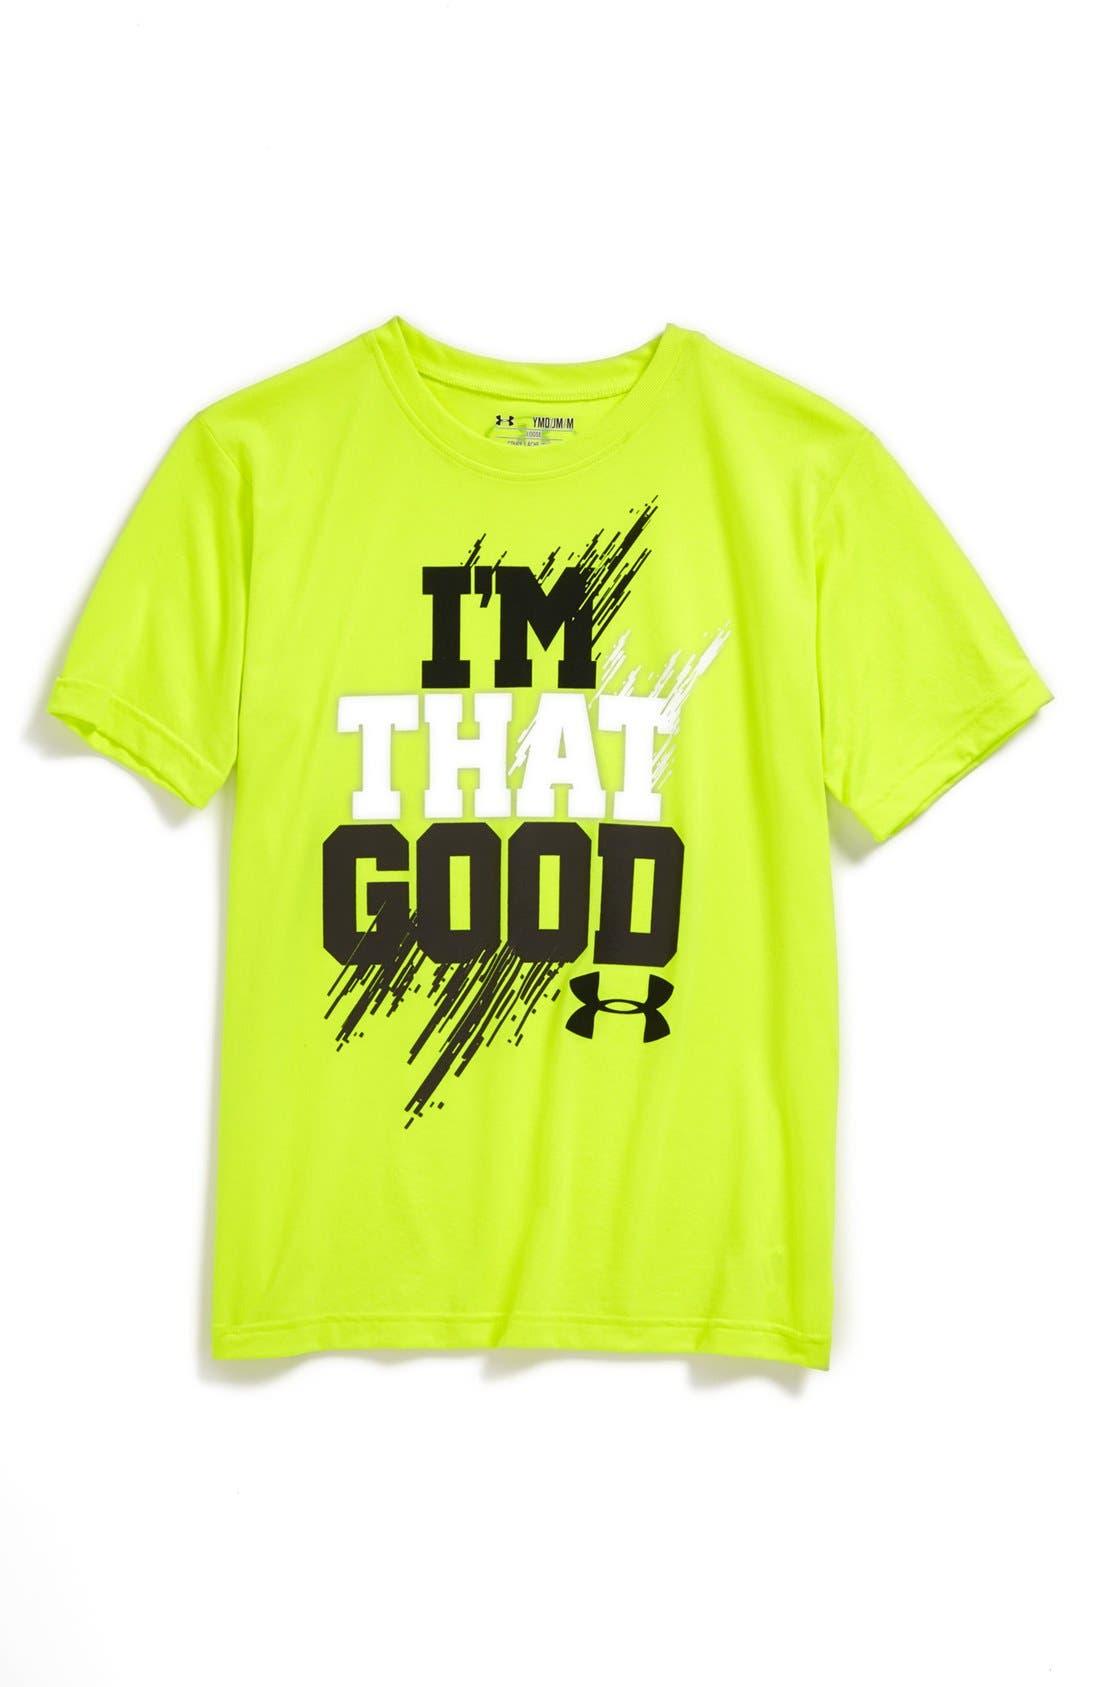 Main Image - Under Armour 'I'm That Good' HeatGear® T-Shirt (Big Boys)